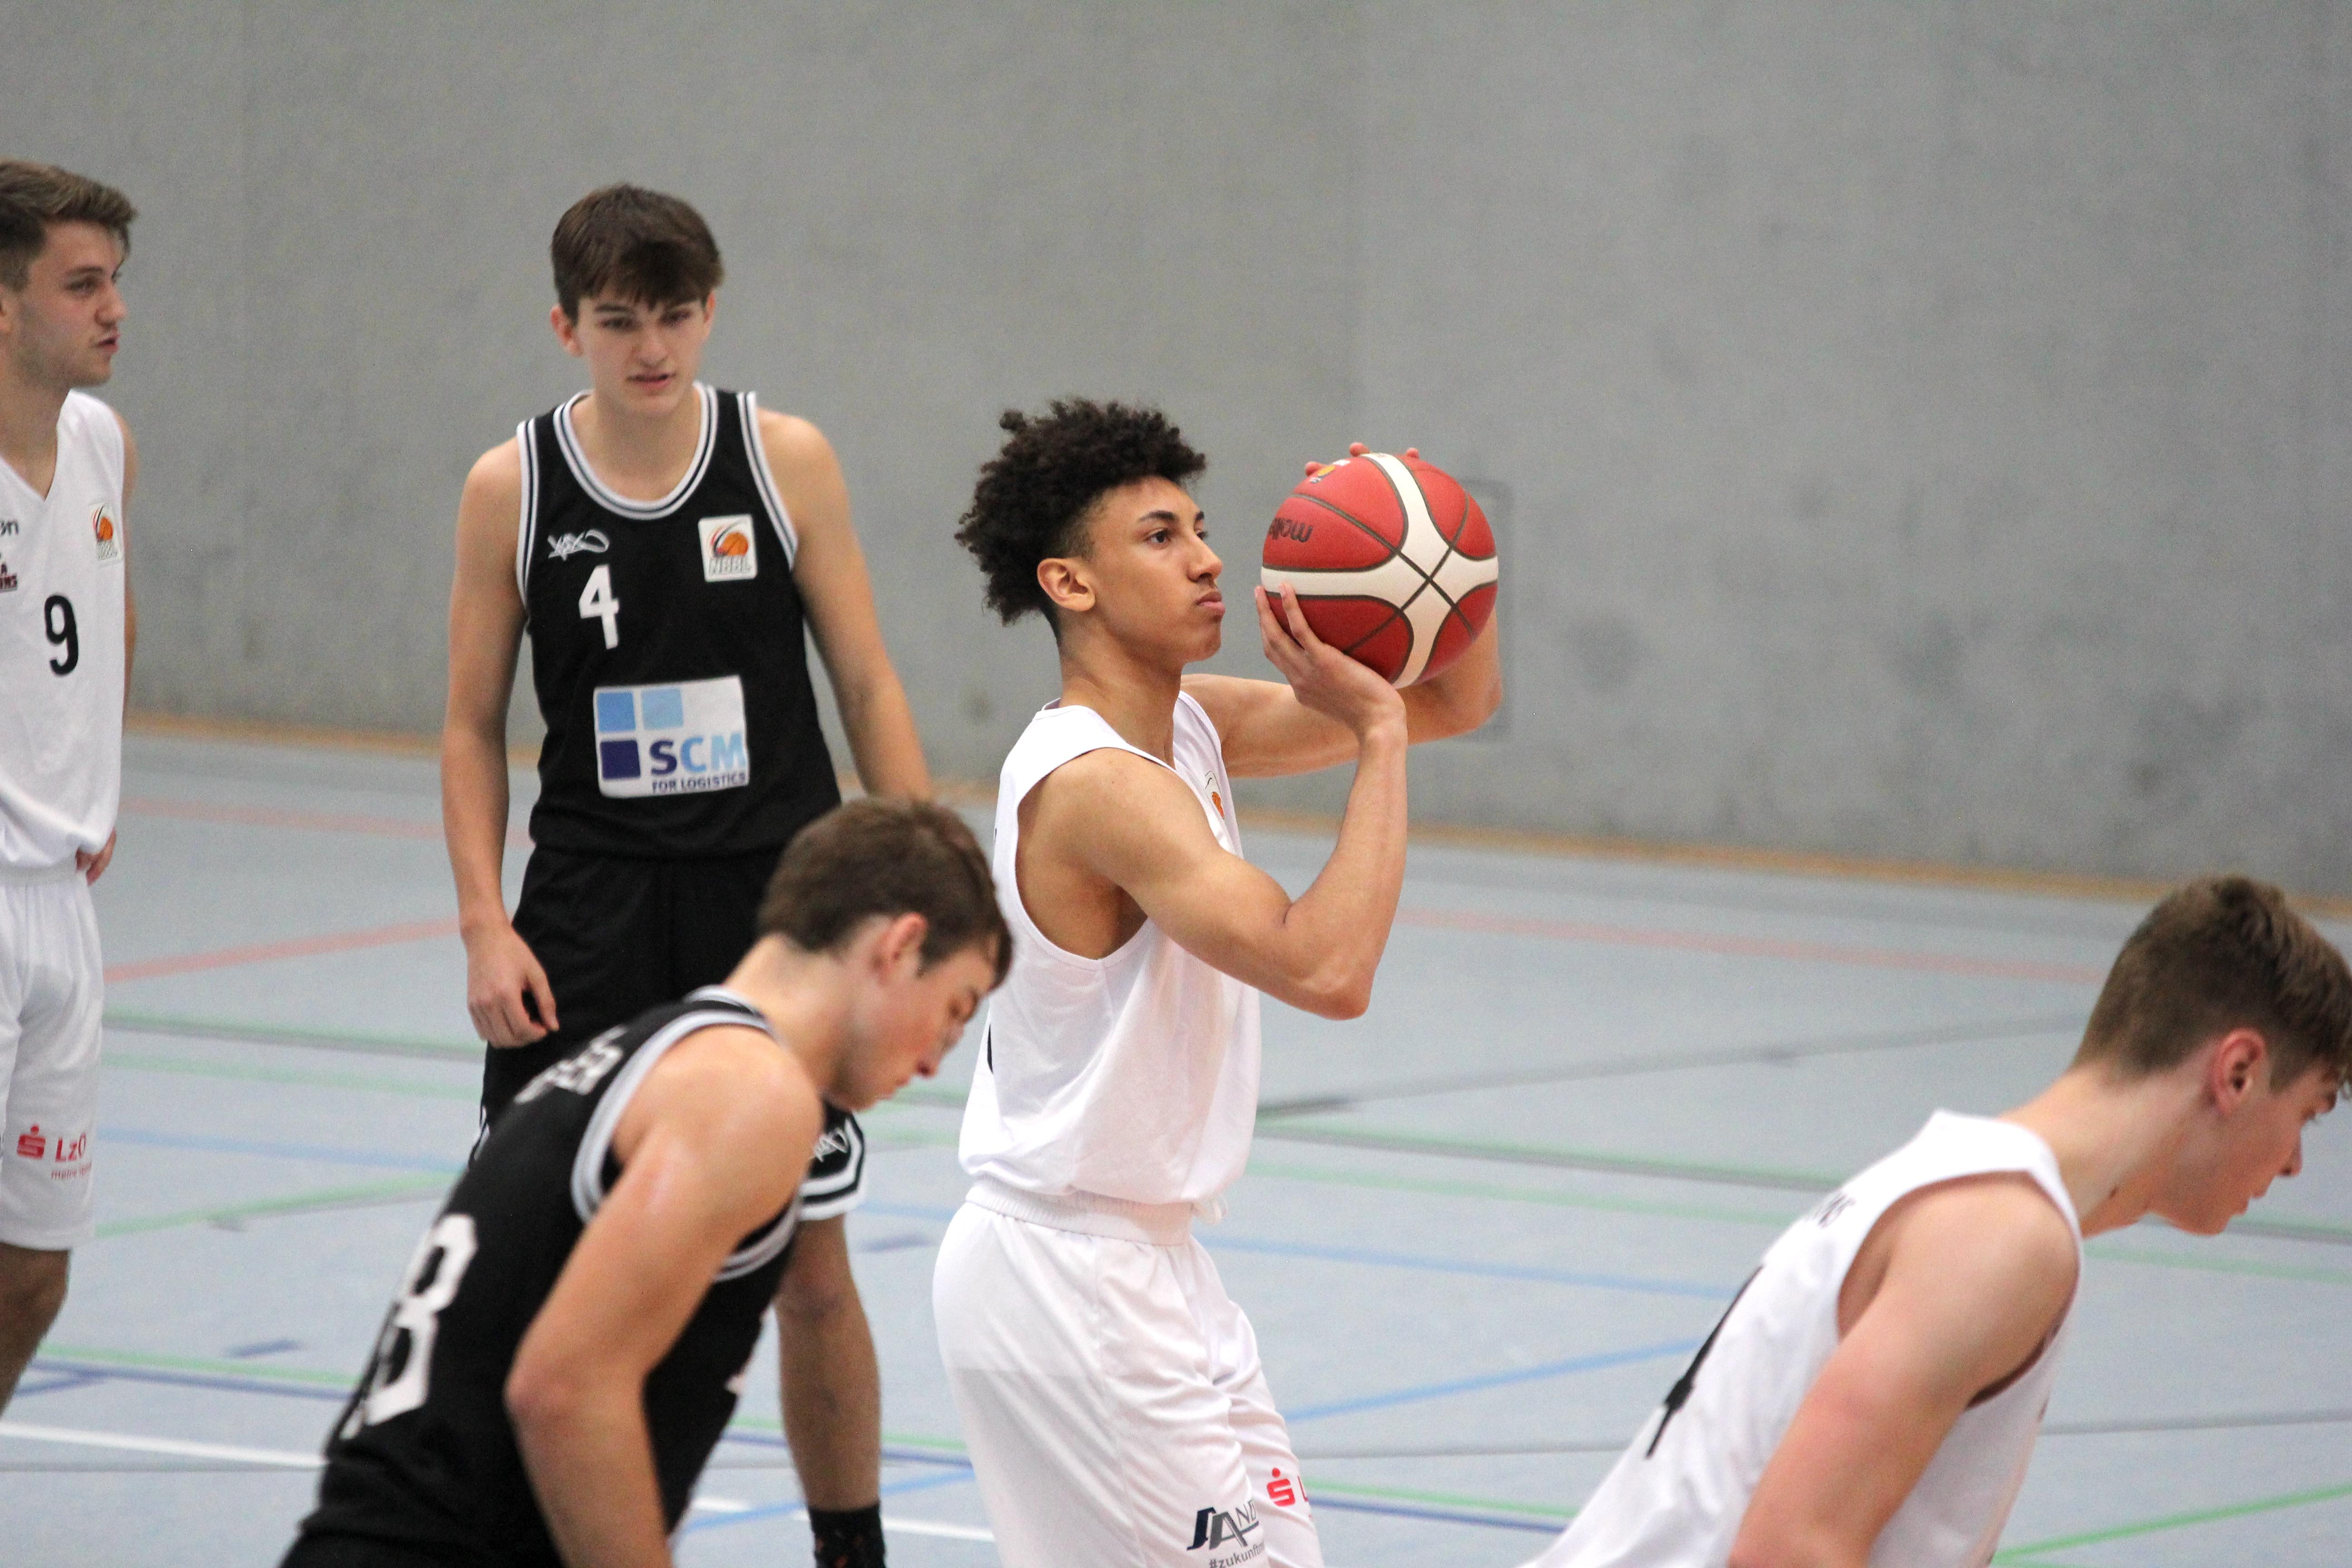 NBBL_20-21_YOUNG-RASTA-DRAGONS_Münster_Spieltag1_Justin-Onyejiaka_3